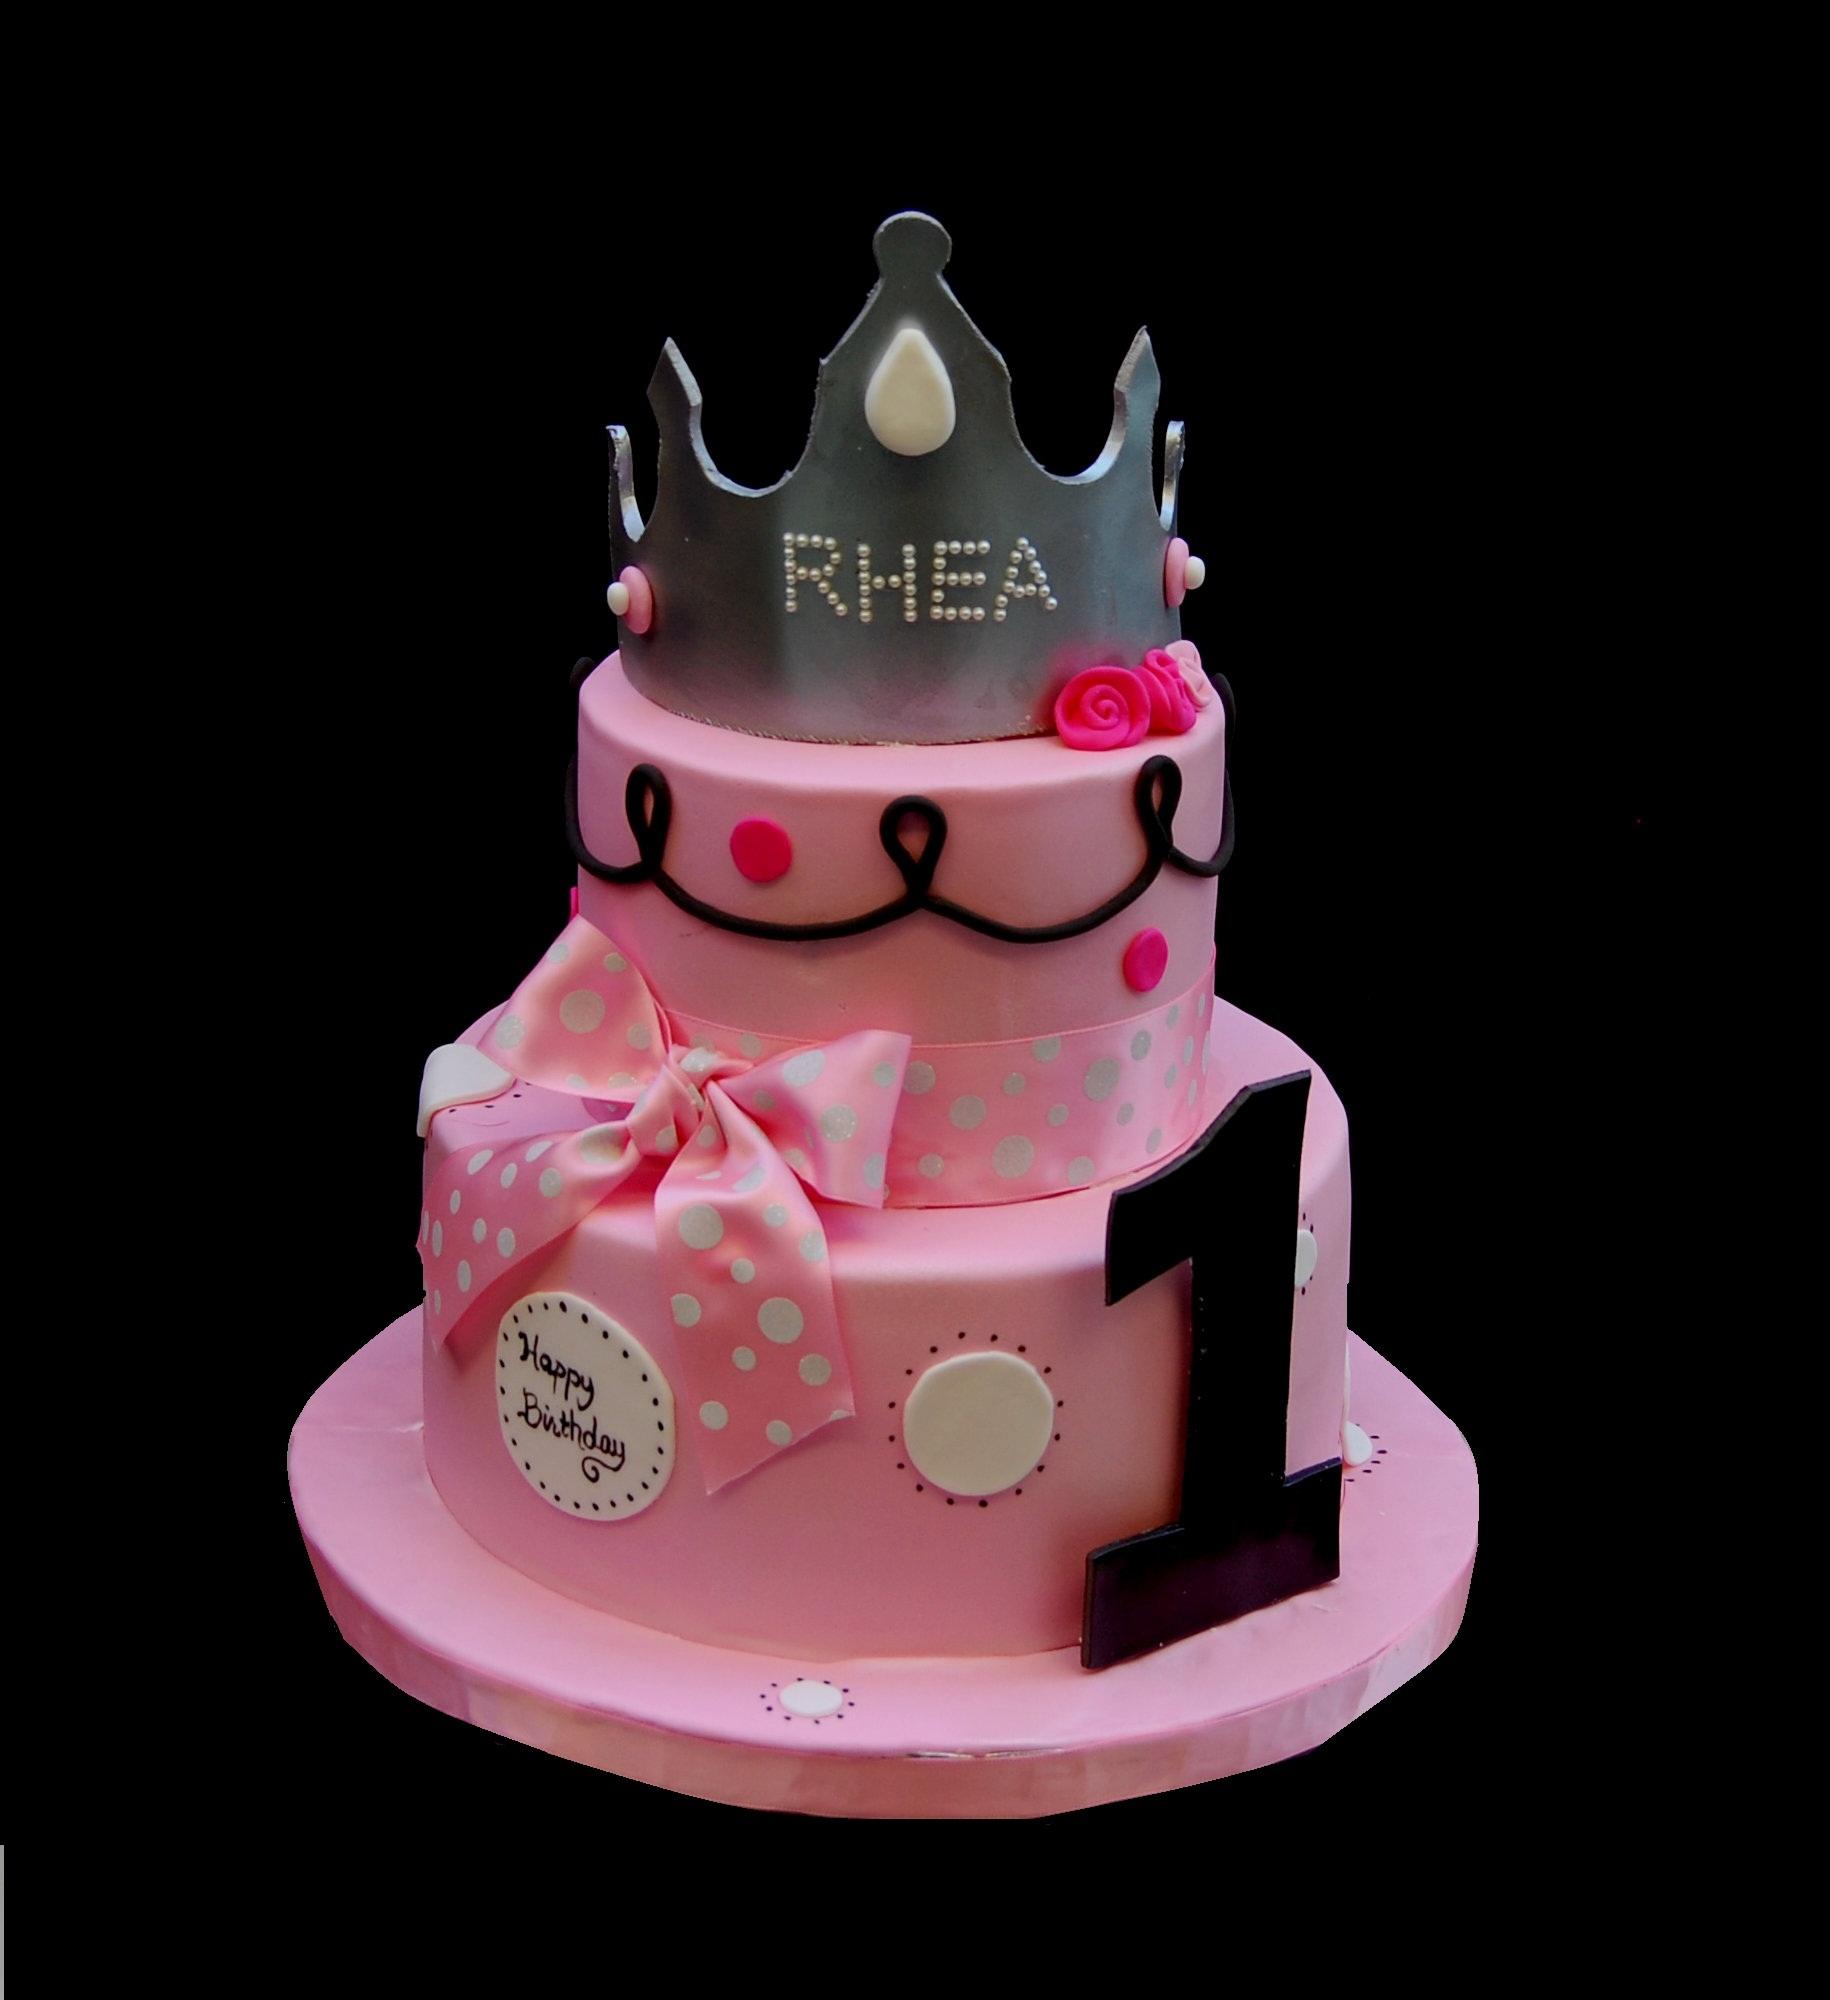 8 Princess Birthday Cakes 1 Year Old Girl Photo